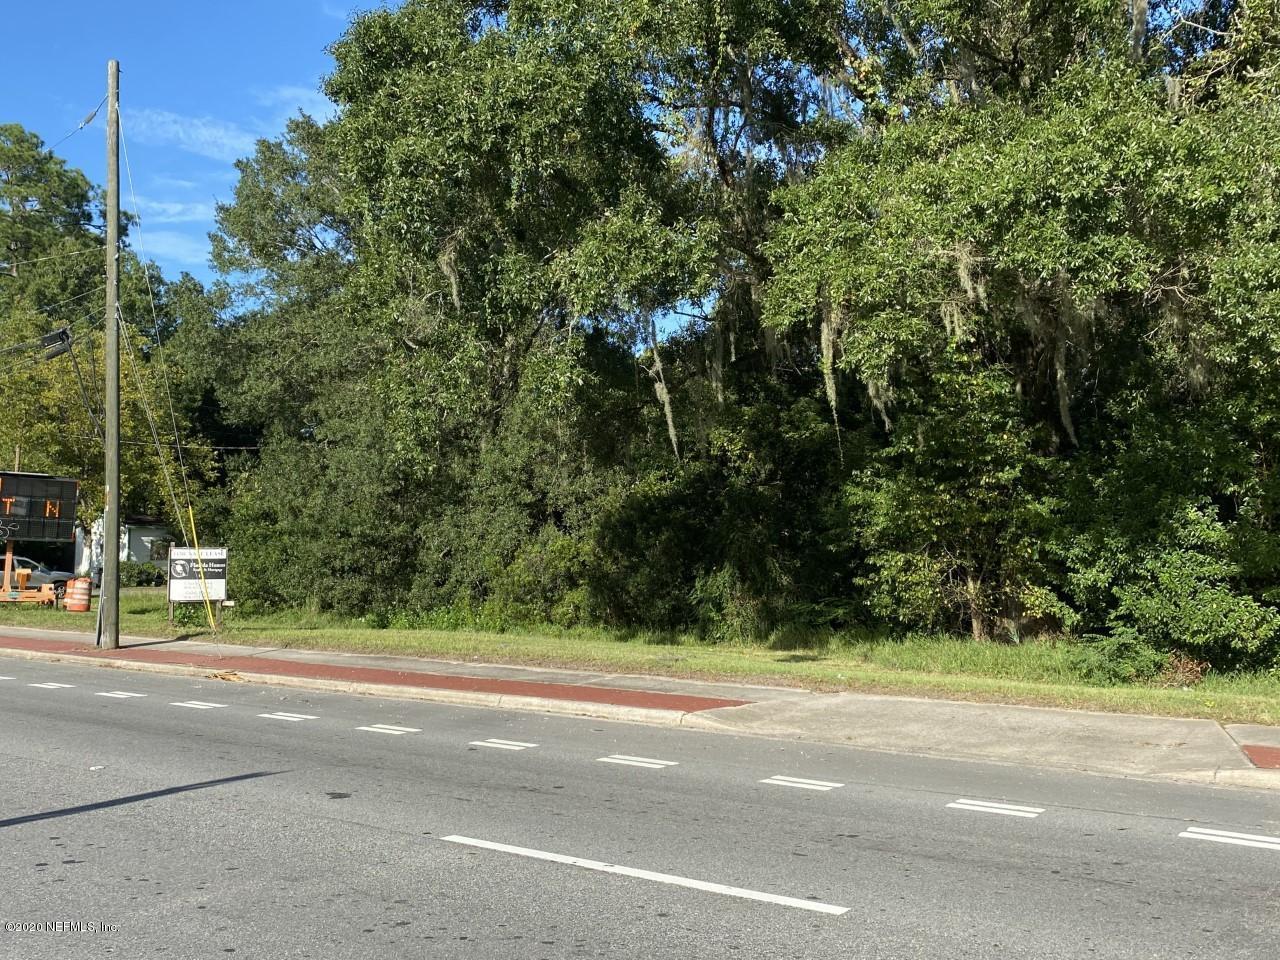 0 US HIGHWAY 301, BALDWIN, FLORIDA 32234, ,Vacant land,For sale,US HIGHWAY 301,1073379